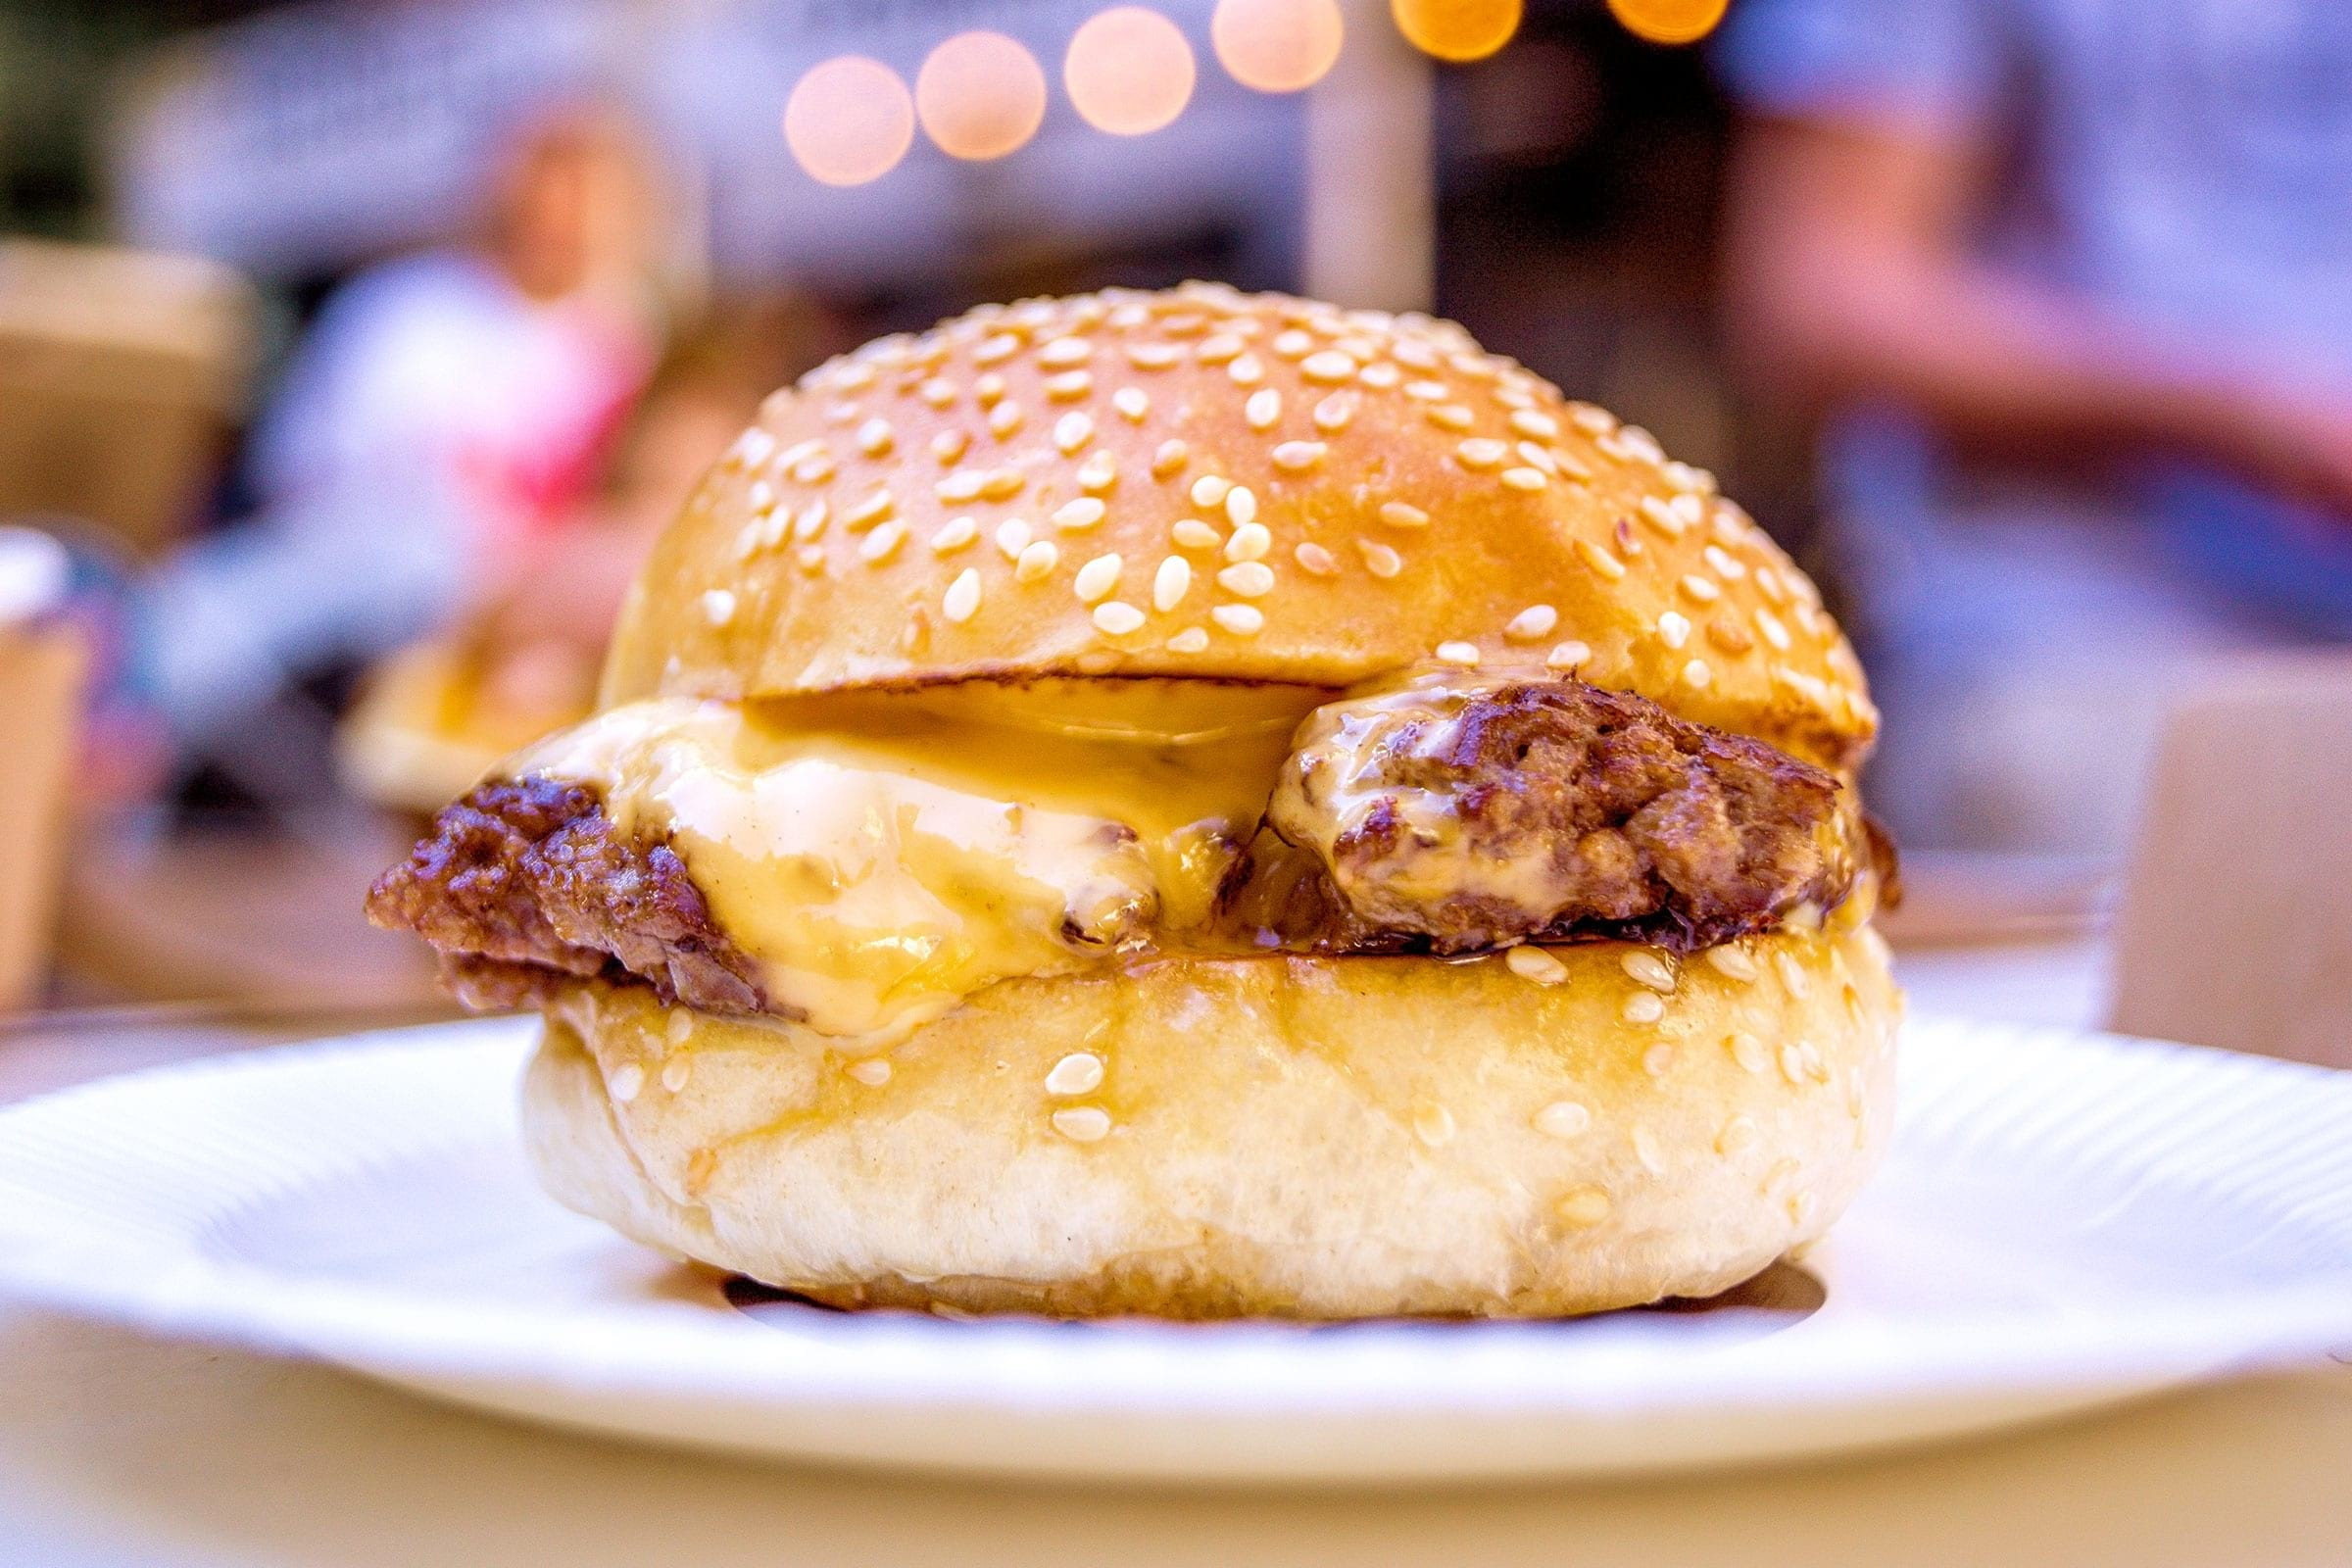 Gasoline Grill • Burgerdudes